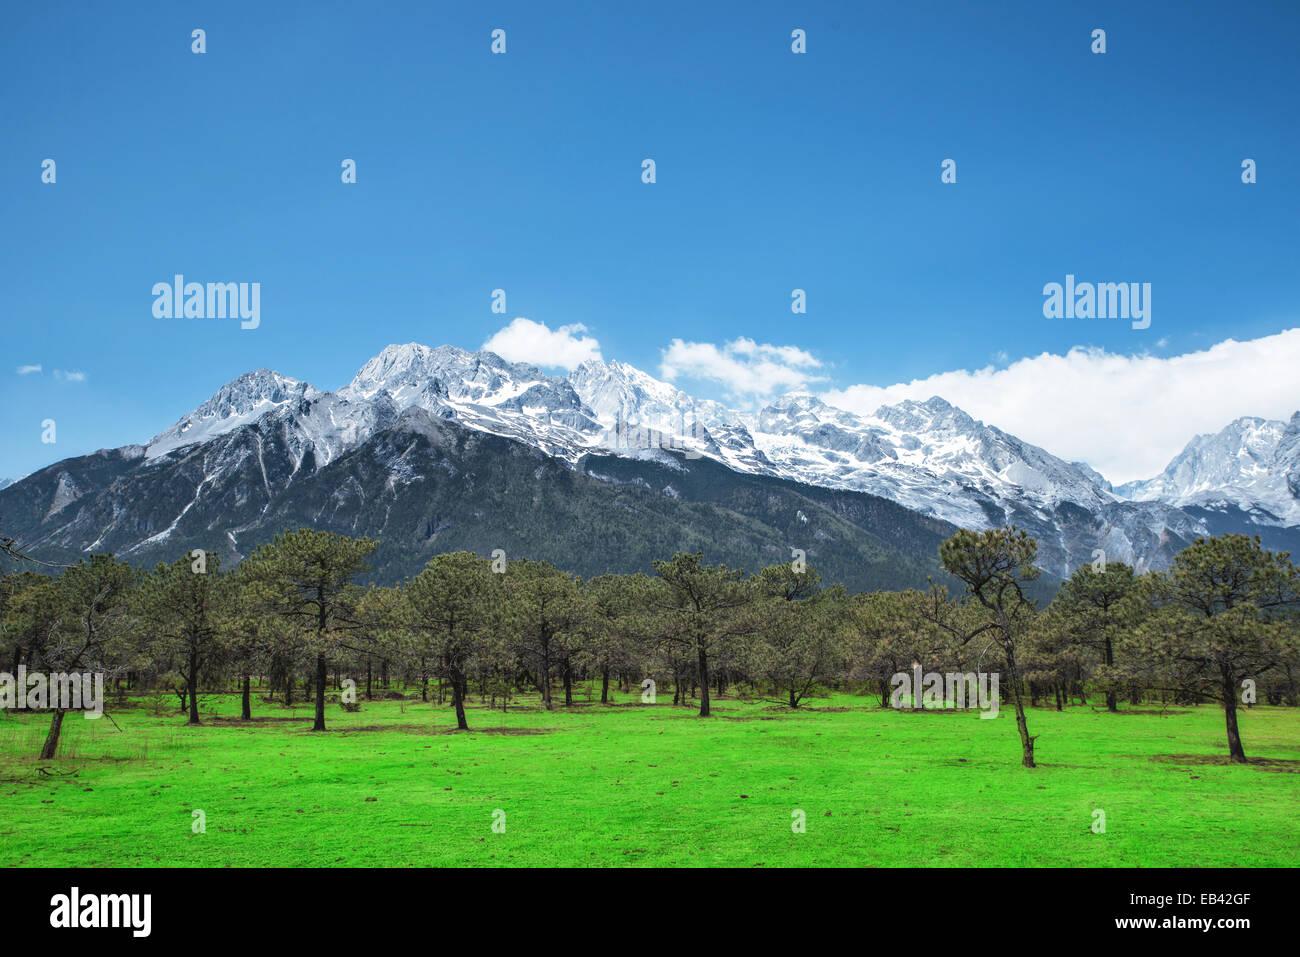 Pine forest and Jade Dragon Snow Mountain, Lijiang, Yunnan China. Stock Photo